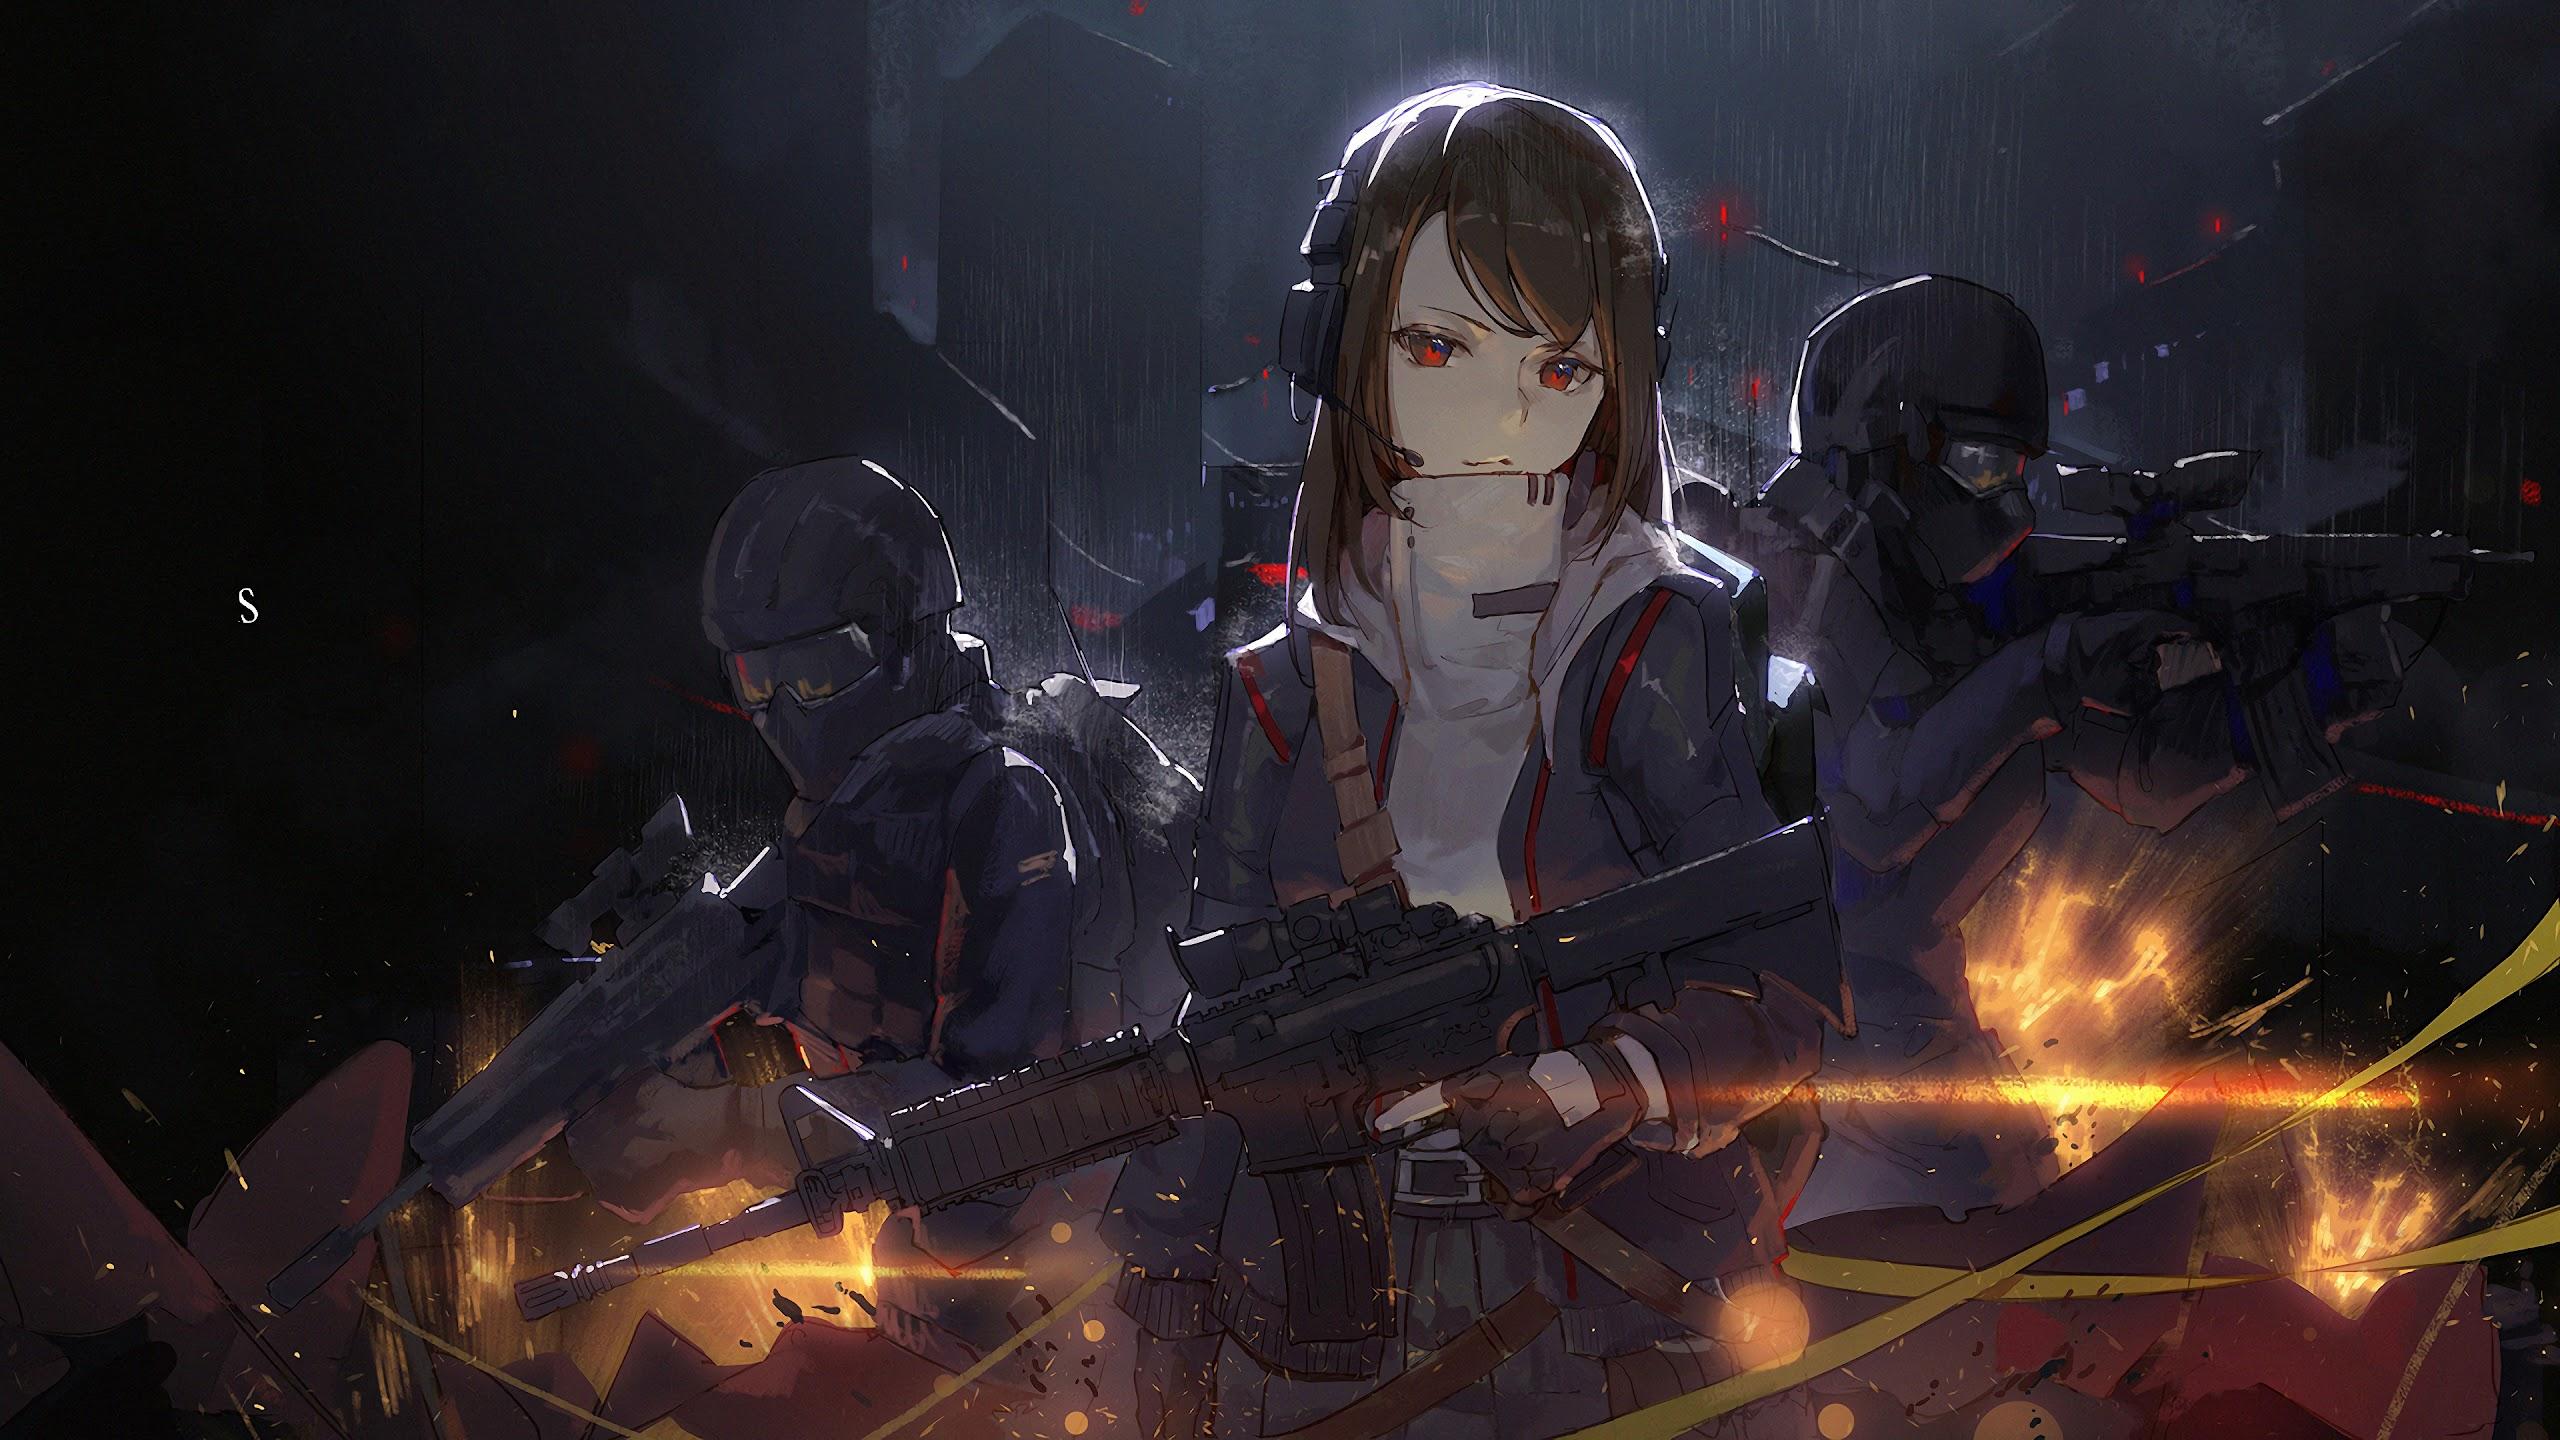 Unduh 200 Wallpaper Anime 4k Pc HD Terbaik